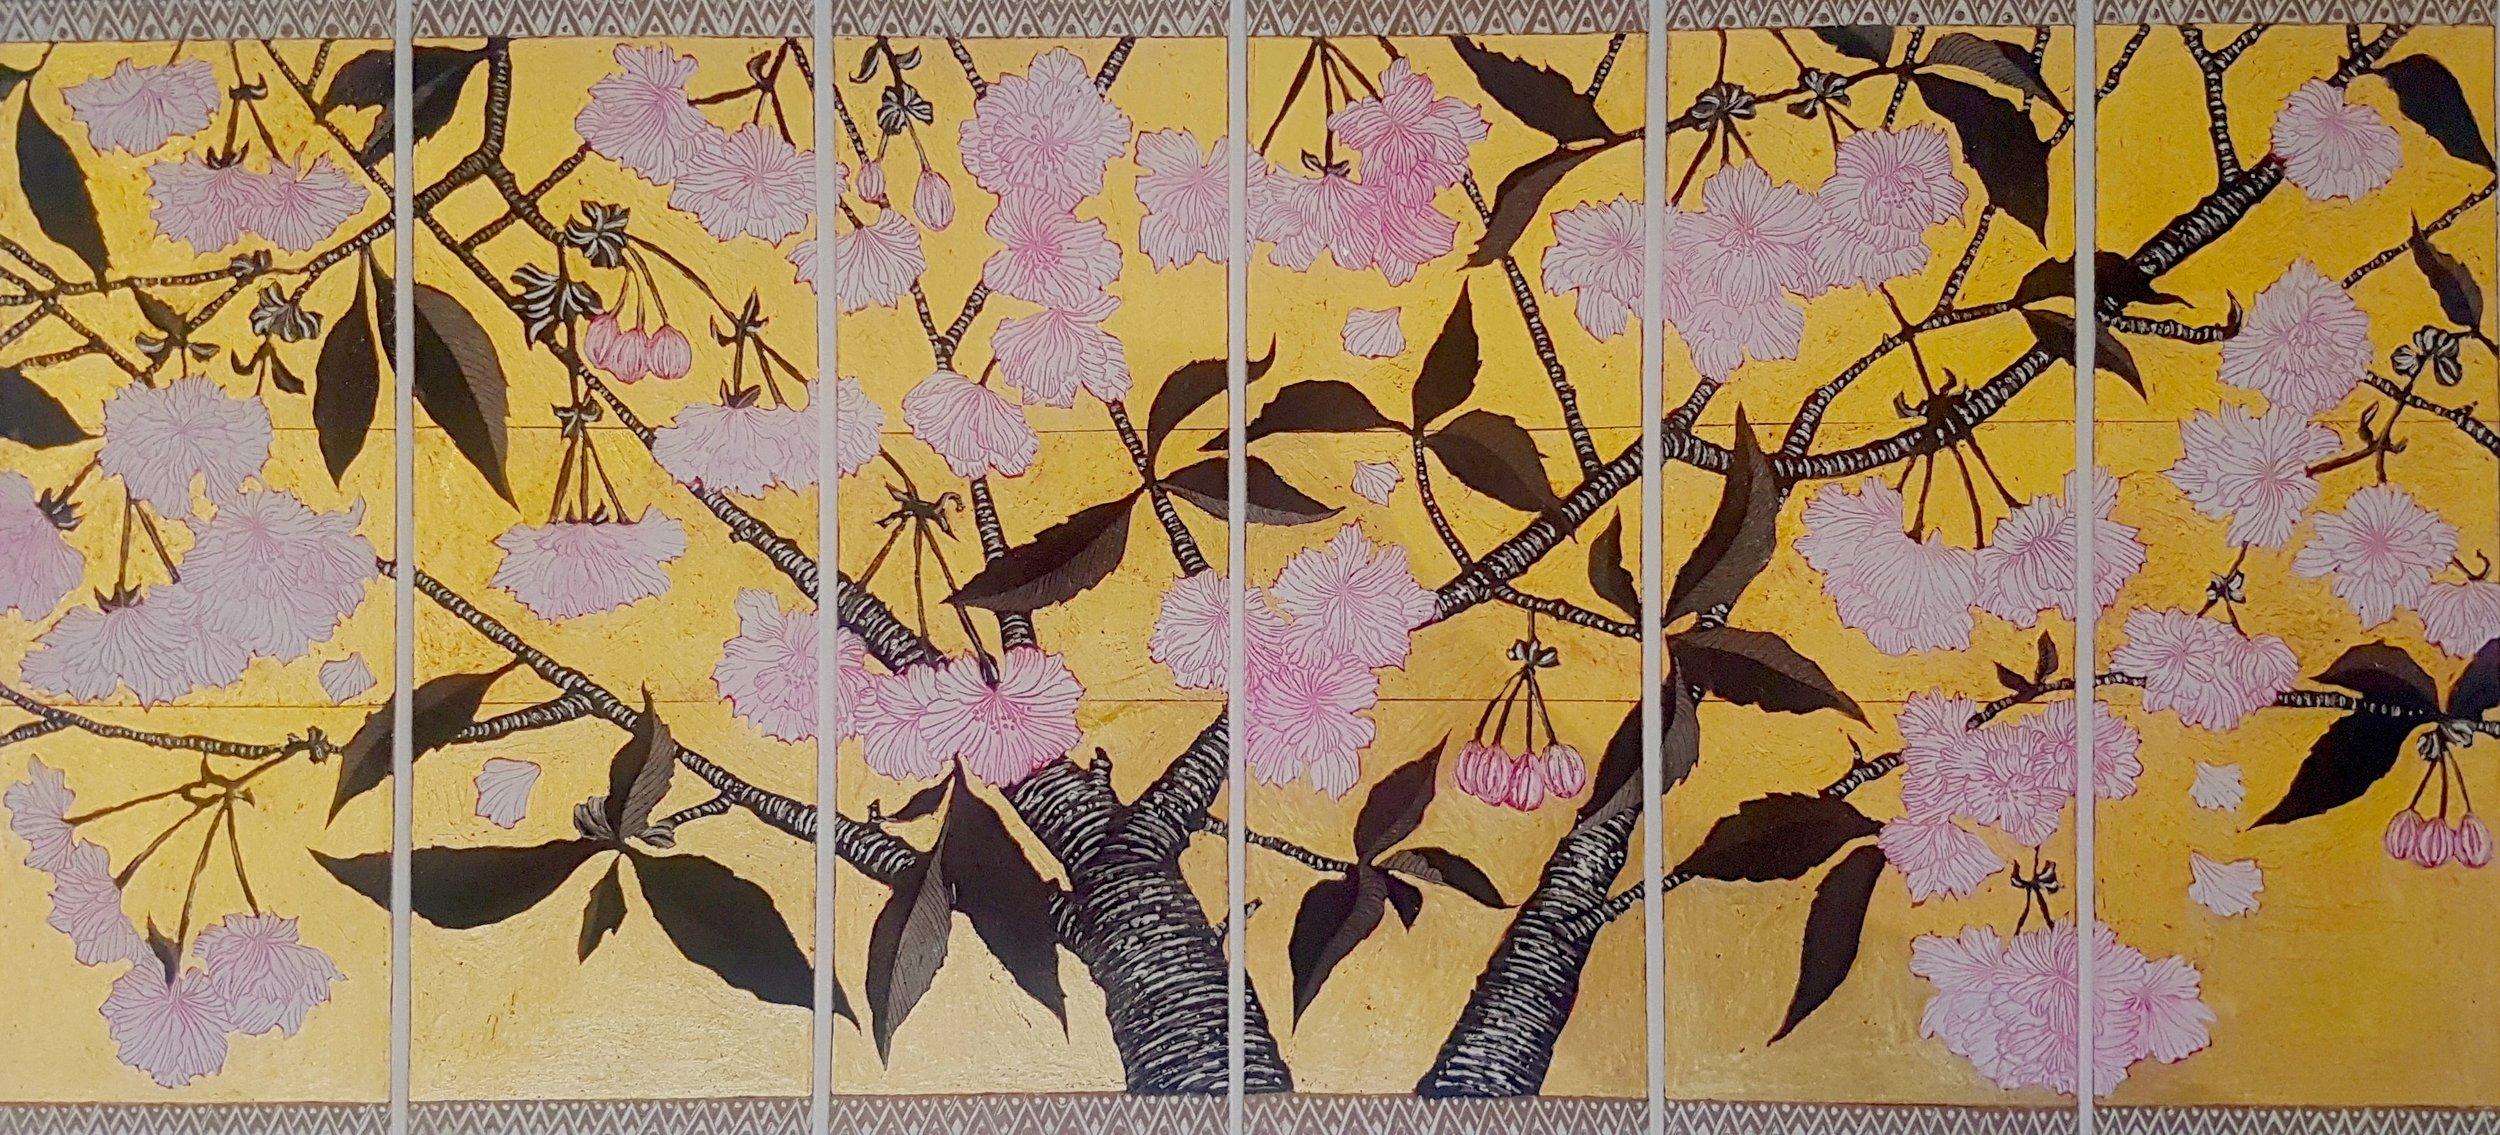 (Under the Cherry Blossom, Jean Bardon)